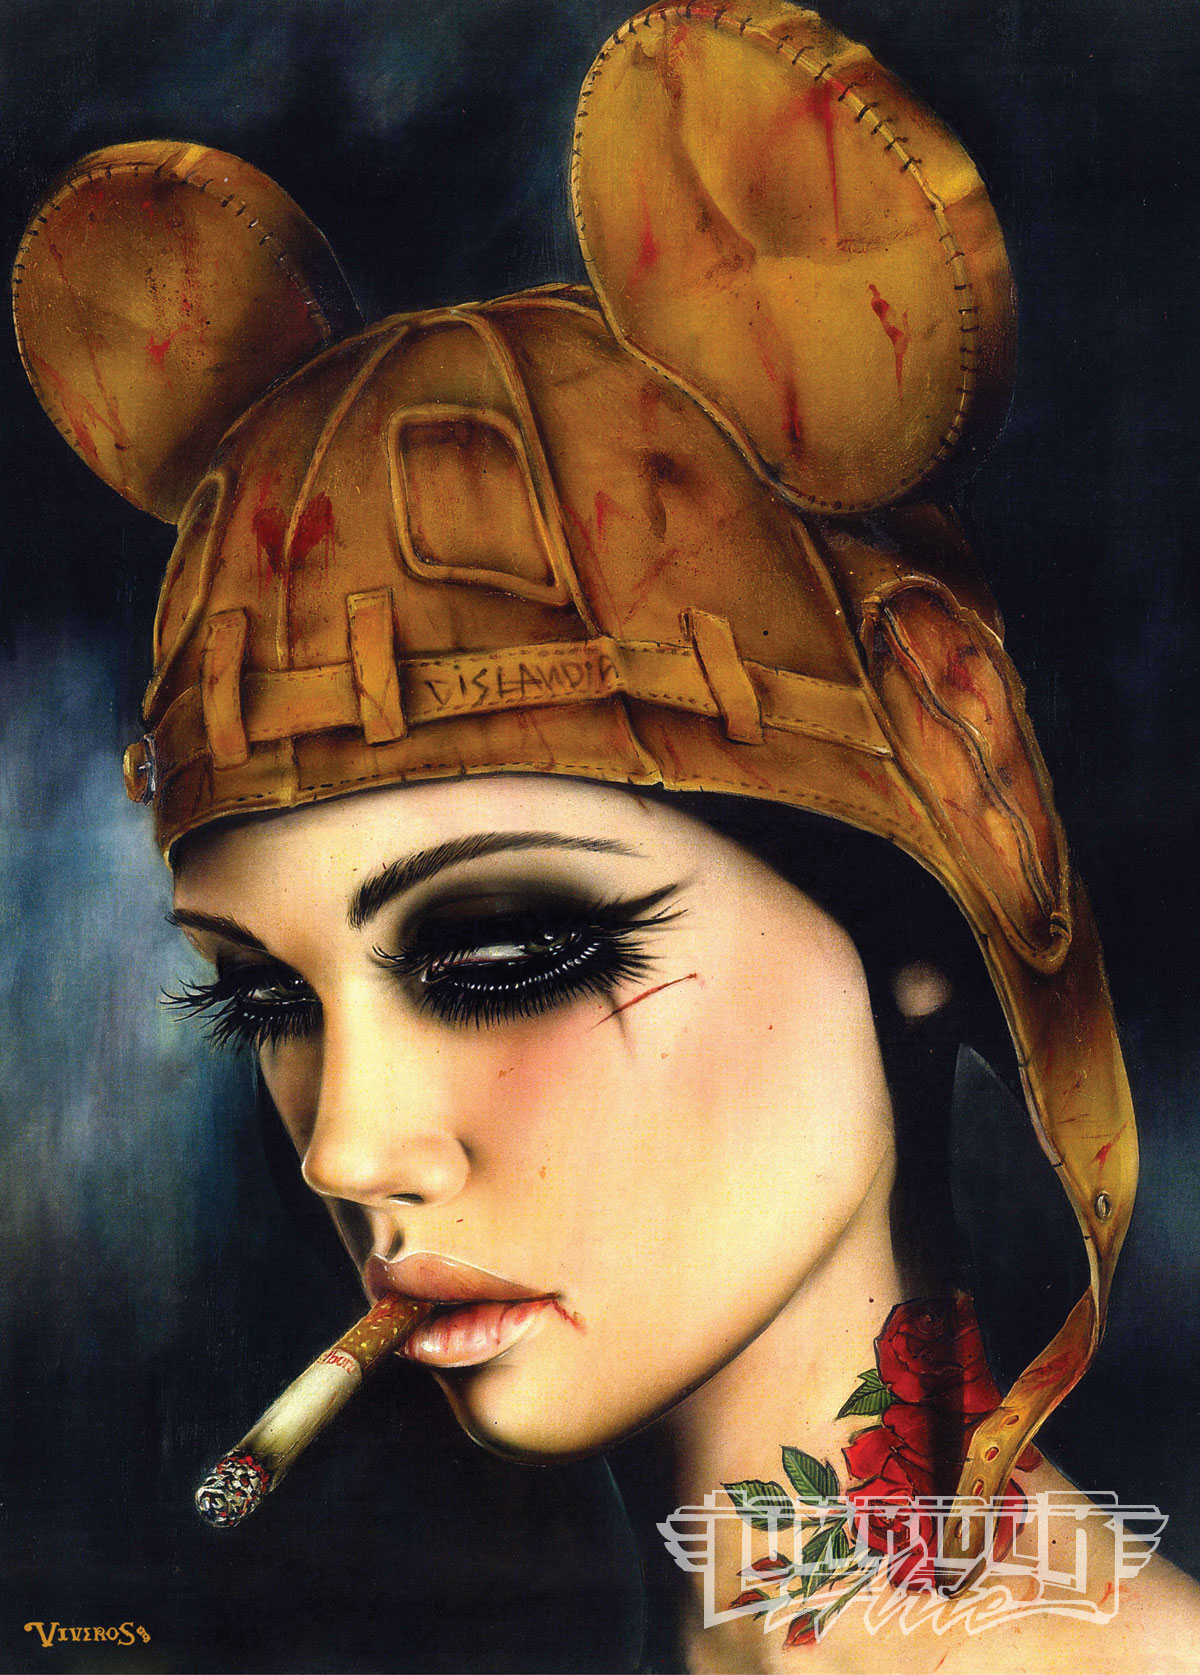 Brian M. Viveros - Lowrider Arte Magazine